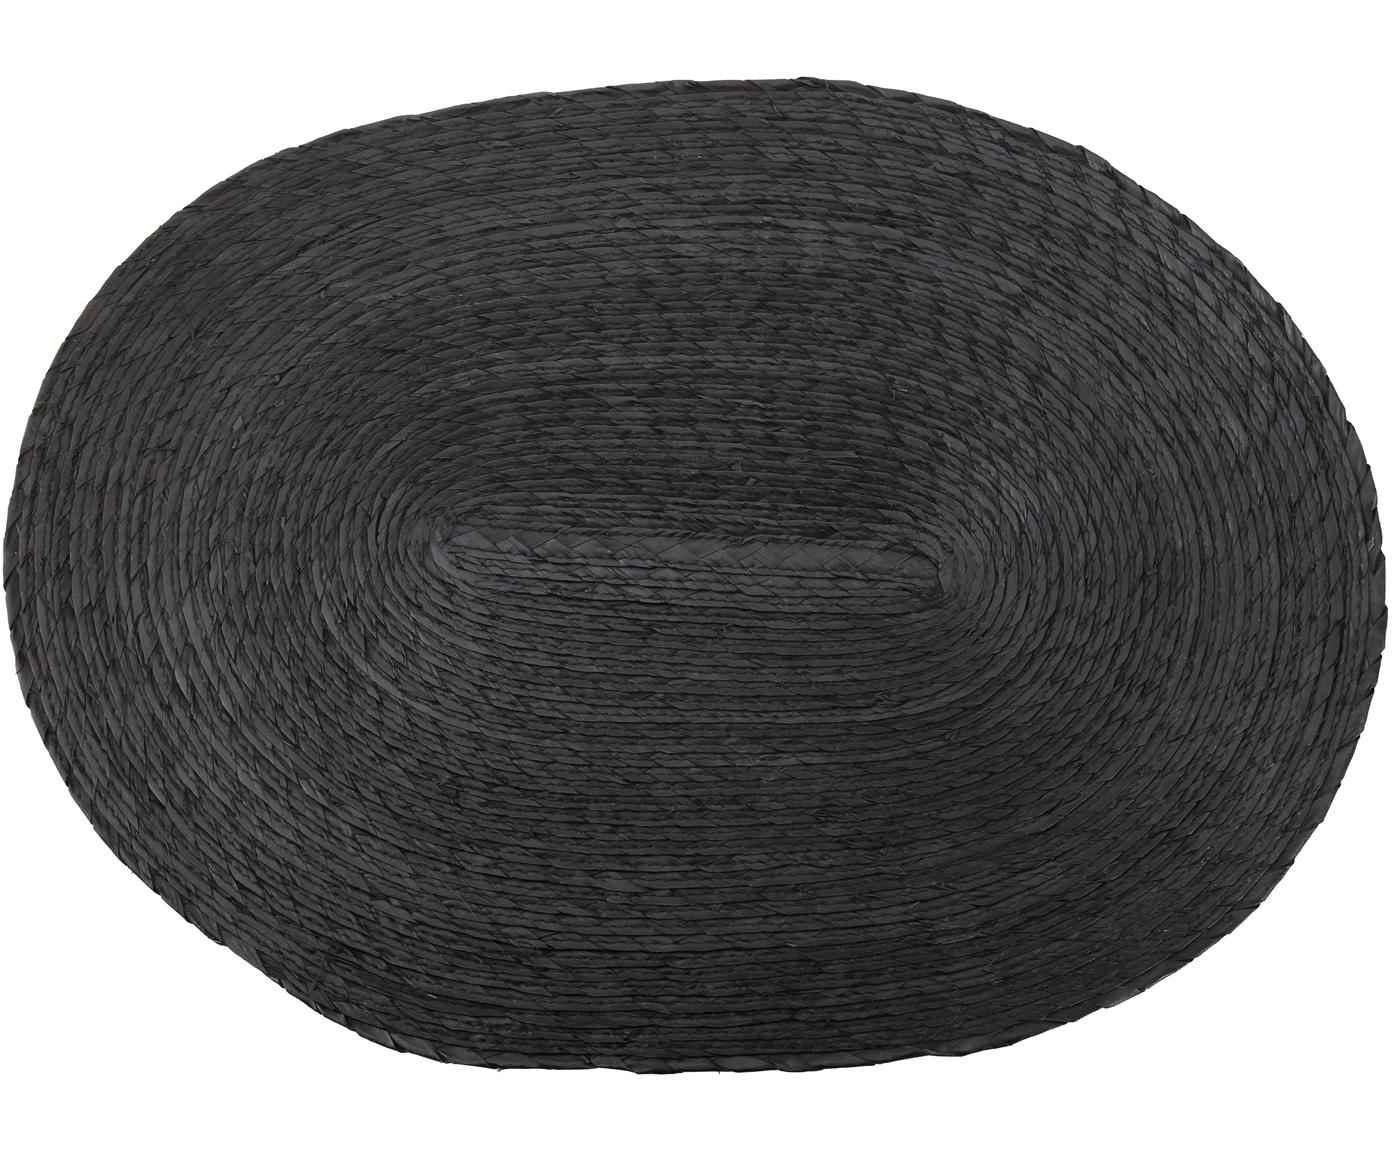 Placemats Mineola, 2 stuks, Palmbladeren, Zwart, 33 x 46 cm